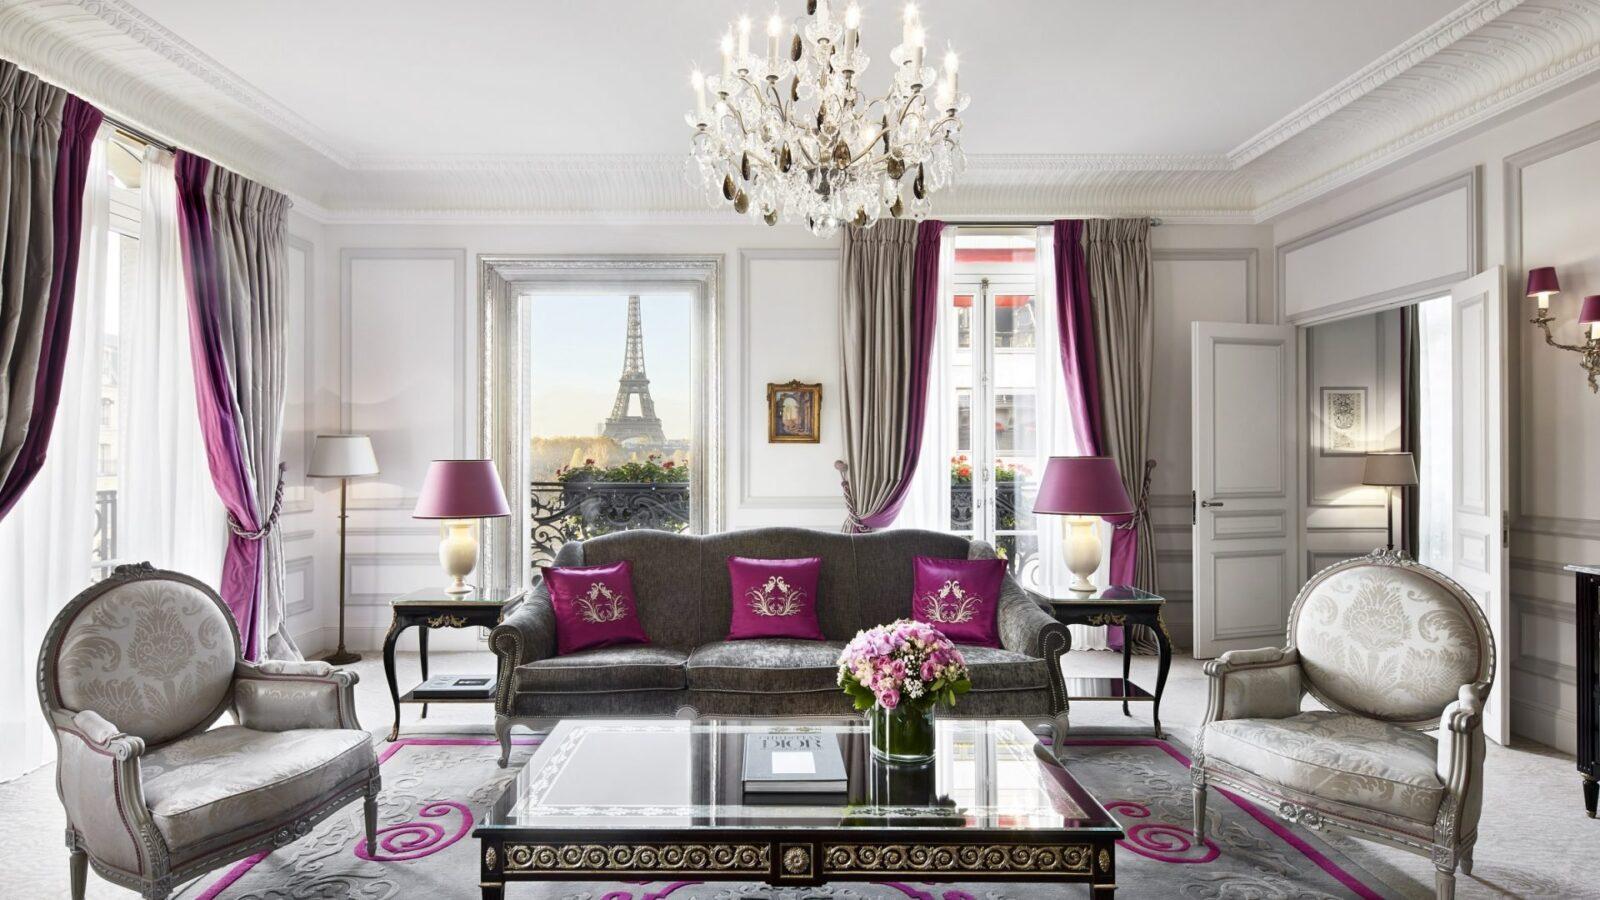 H tel plaza ath n e dorchester collection for A classic touch salon